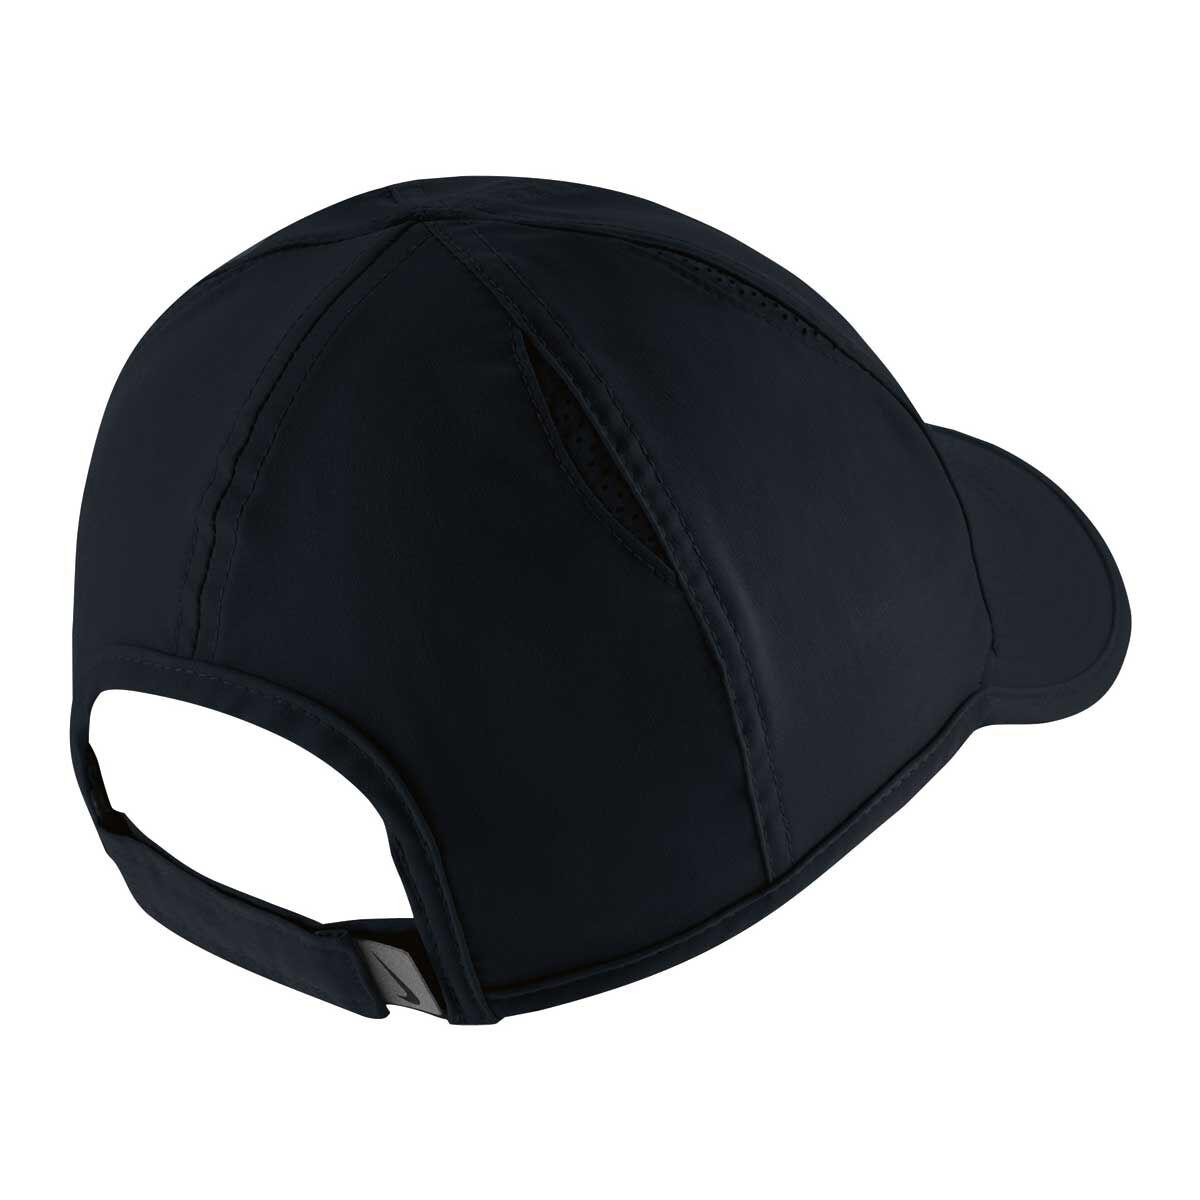 ... low price nike womens featherlight cap black white osfa rebelhi res  e1dbe 18dc9 france new style nike womens featherlight dri fit hat cosmic ... 7c52c1401185